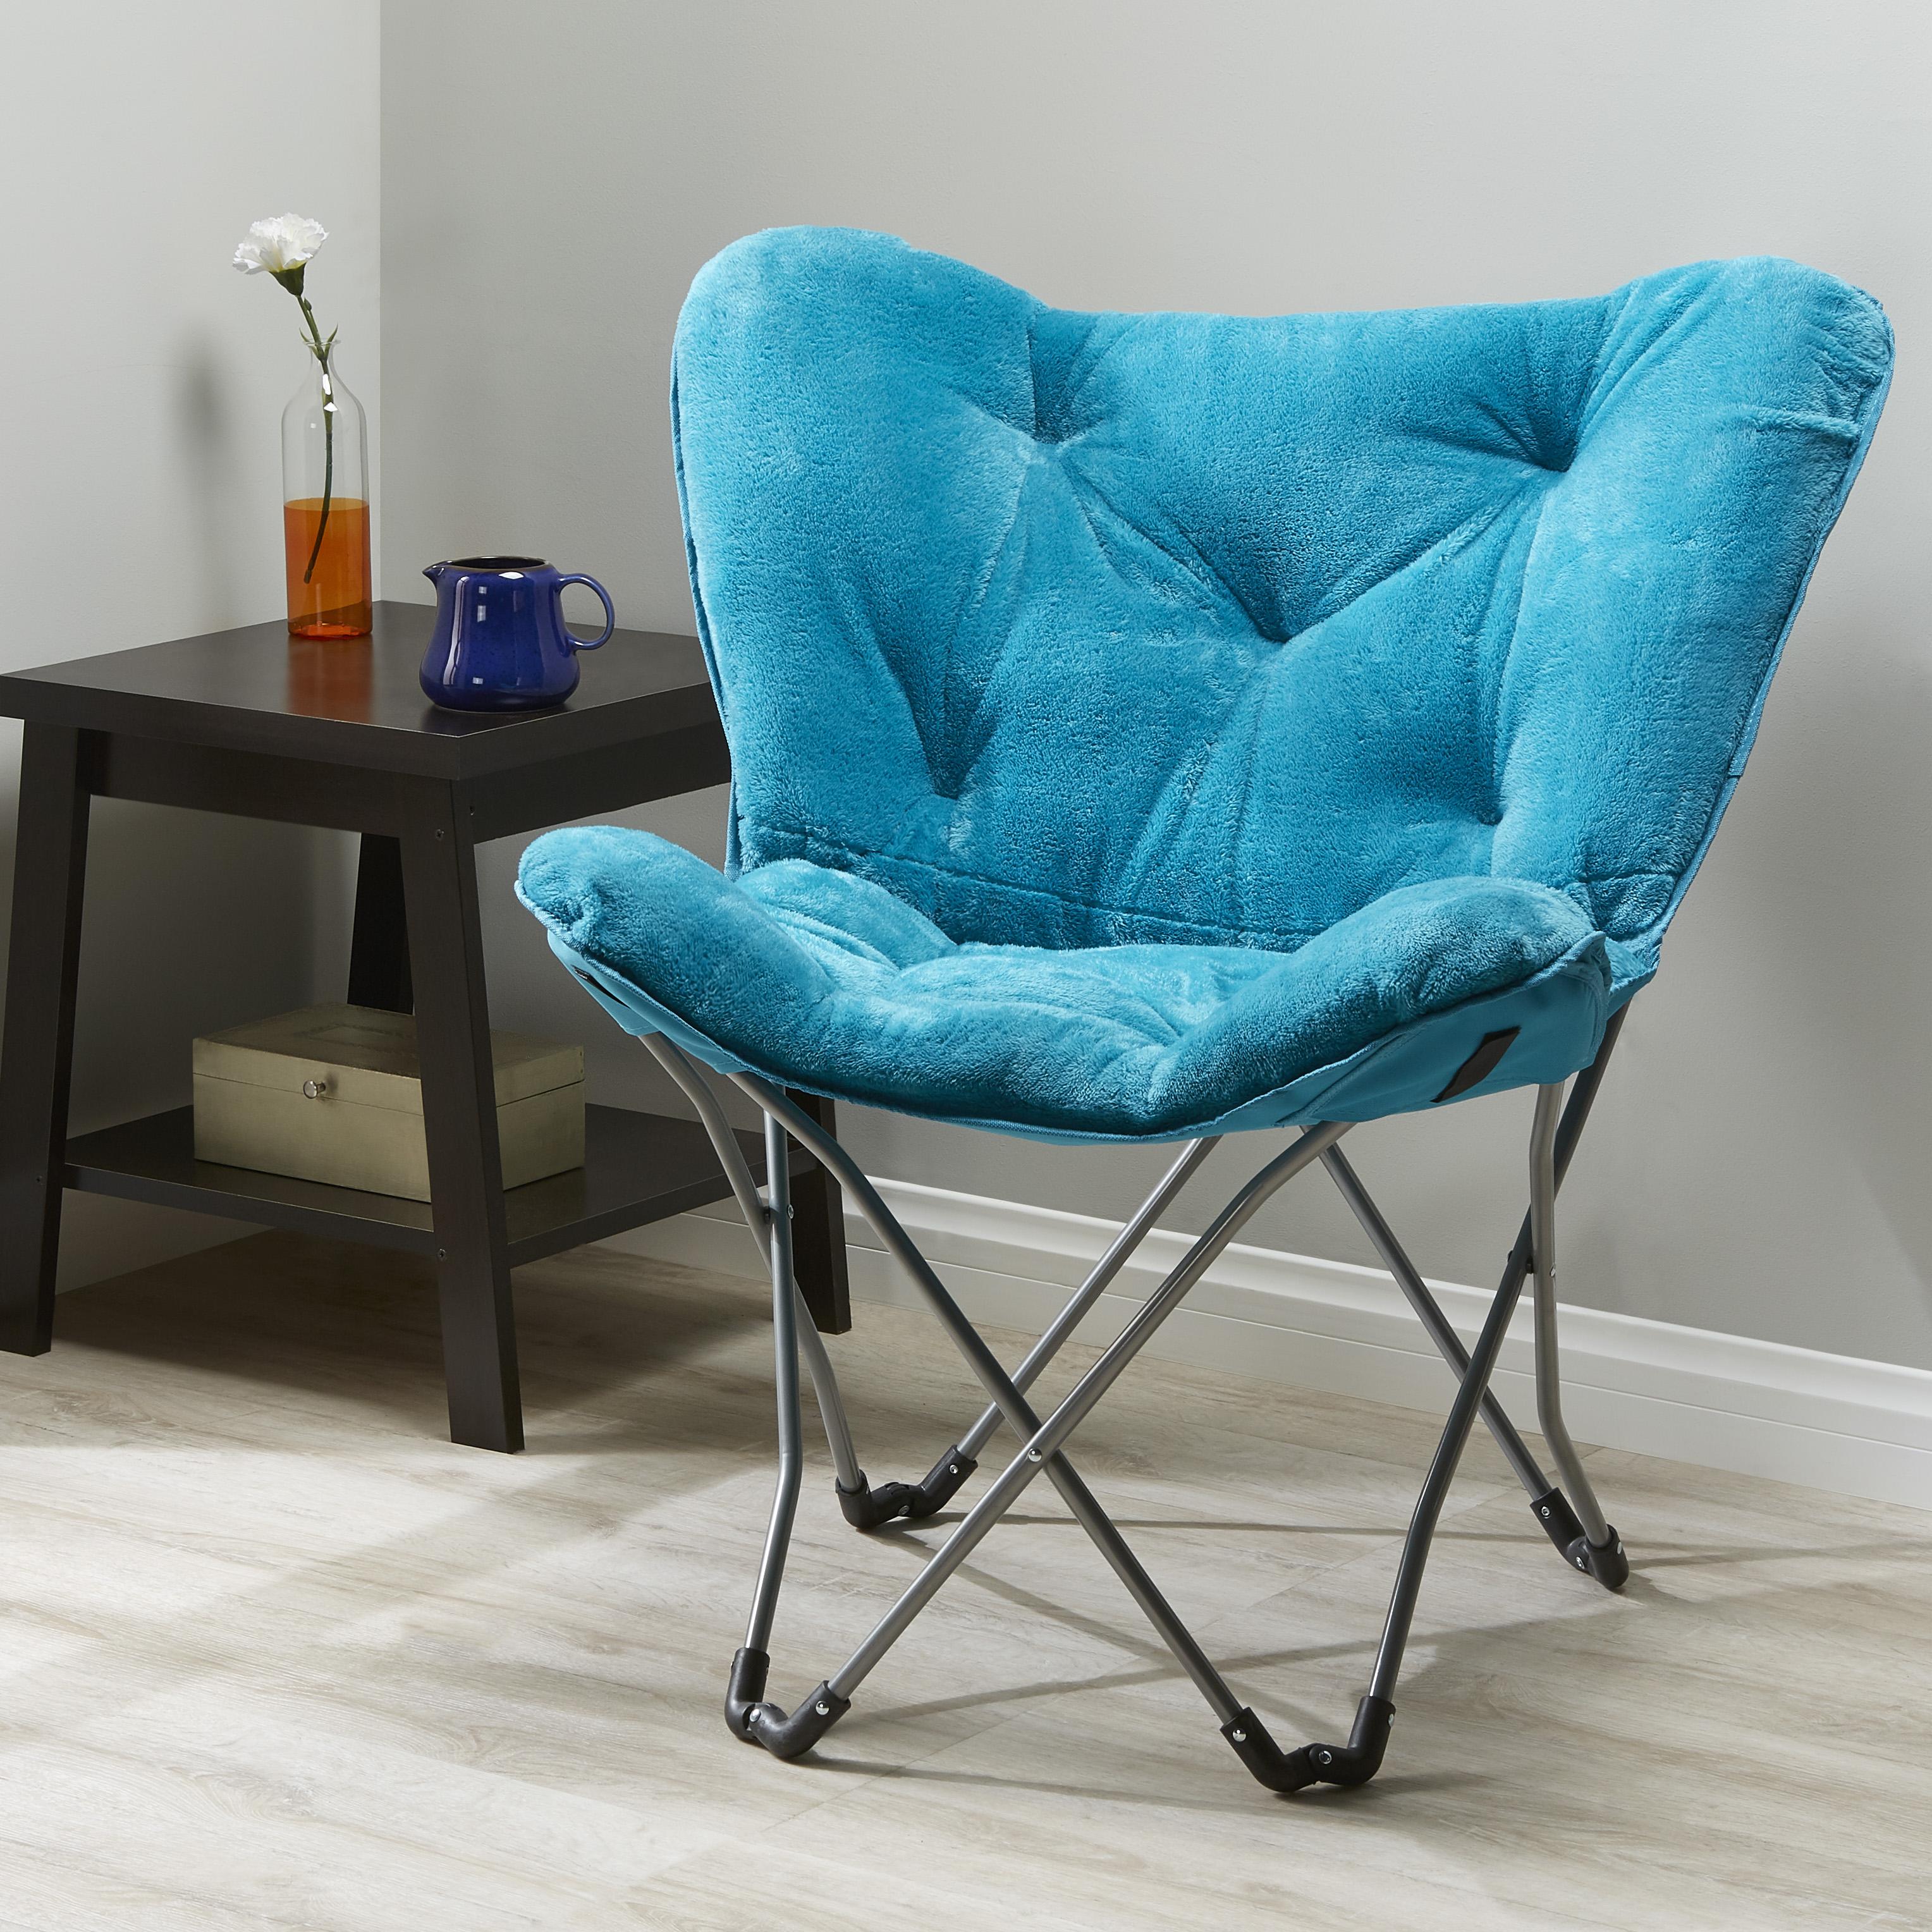 Wondrous Mainstays Folding Butterfly Chair Multiple Colors 19 97 Machost Co Dining Chair Design Ideas Machostcouk